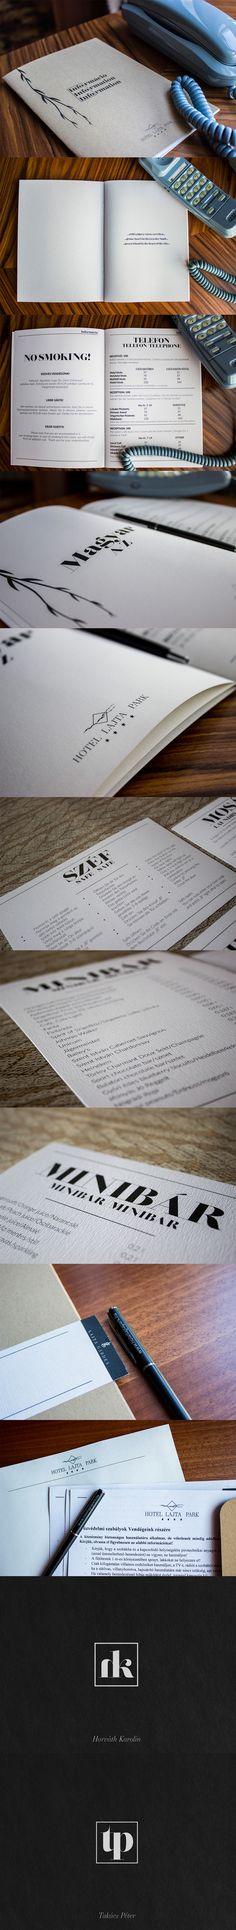 Design: Varga Balázs Project: Hotel Lajta Park Four stars hotel brand design Brand Design, My Works, Park, Parks, Branding Design, Corporate Design